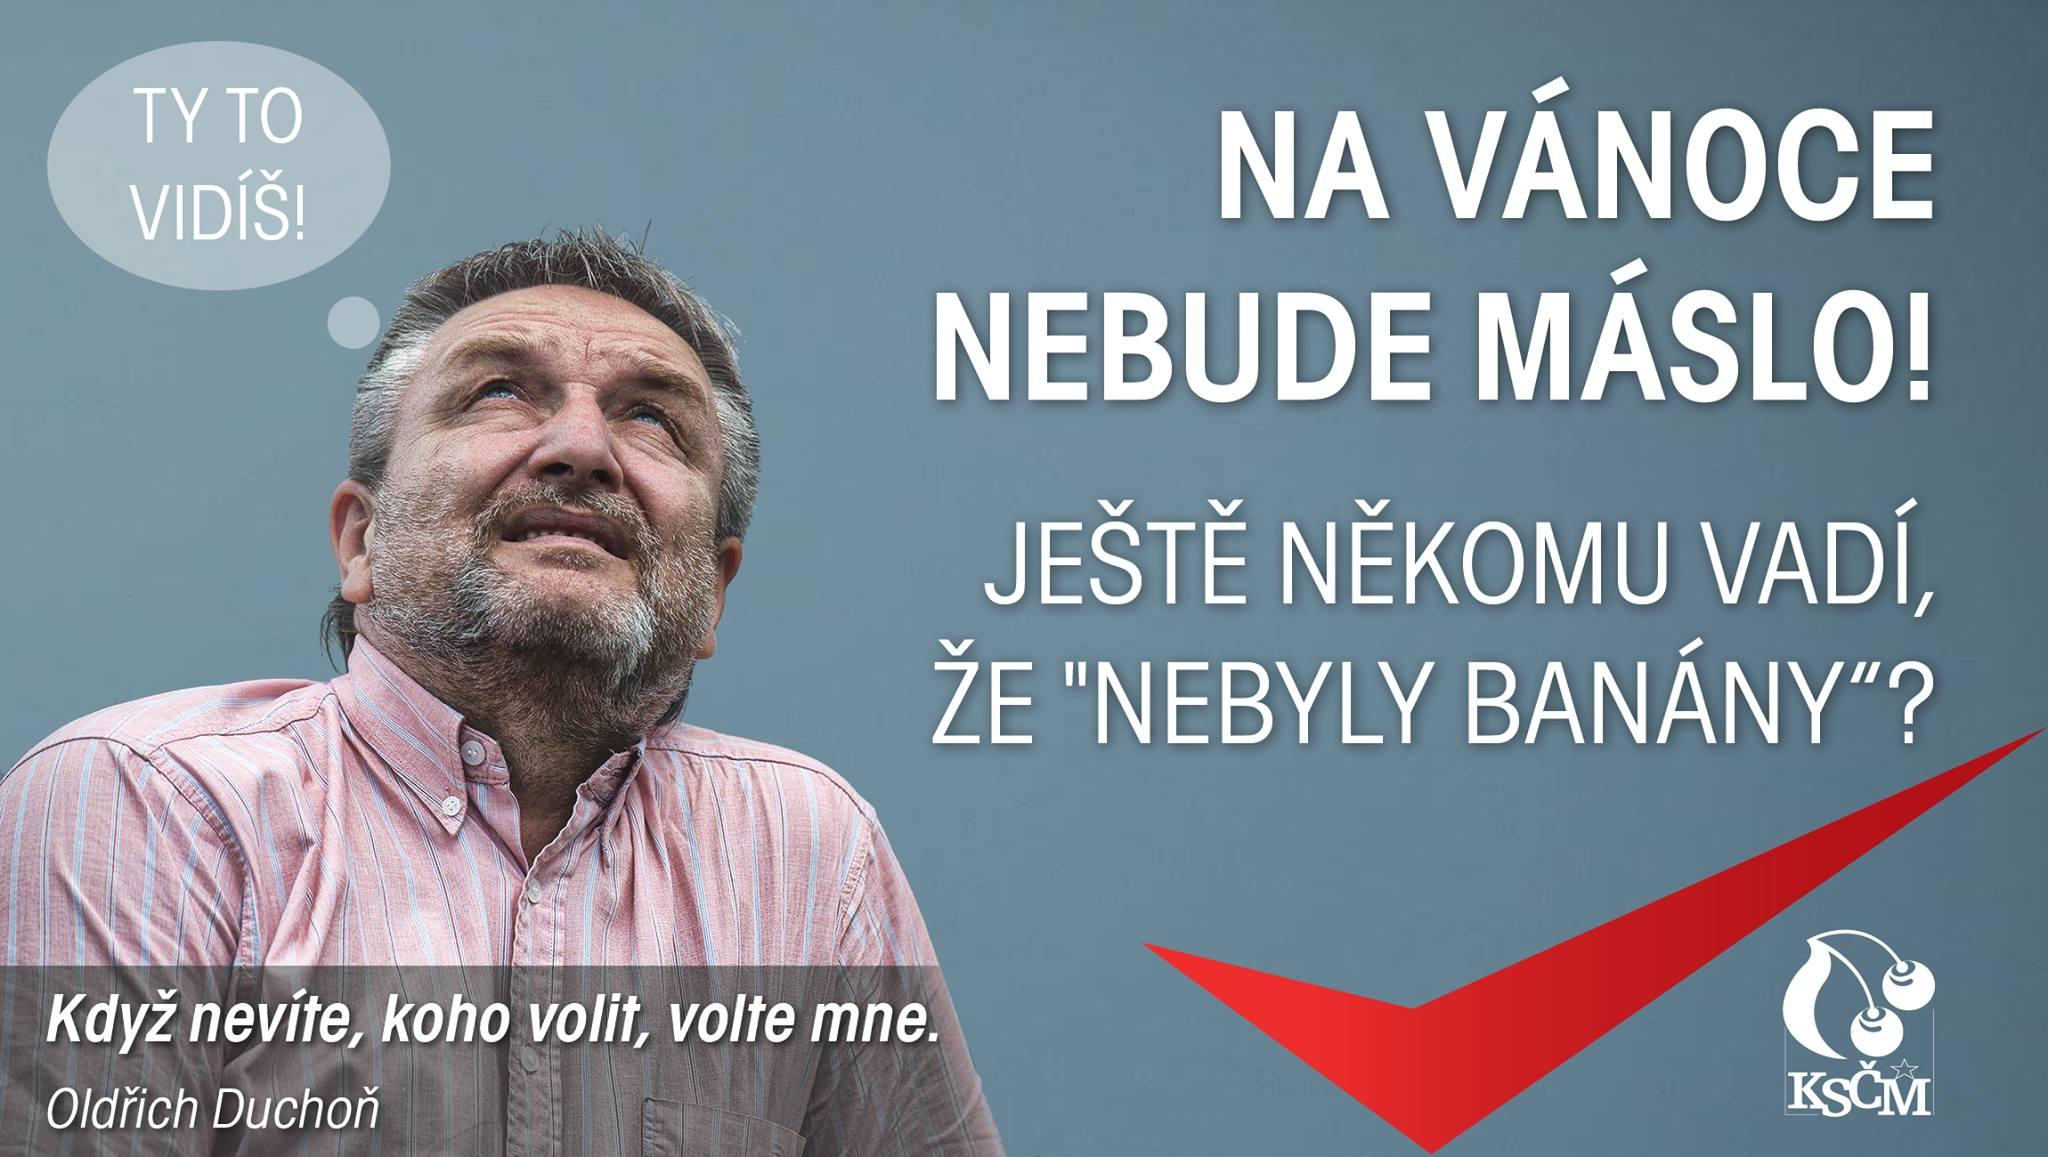 Kandidát KSČM Oldřich Duchoň